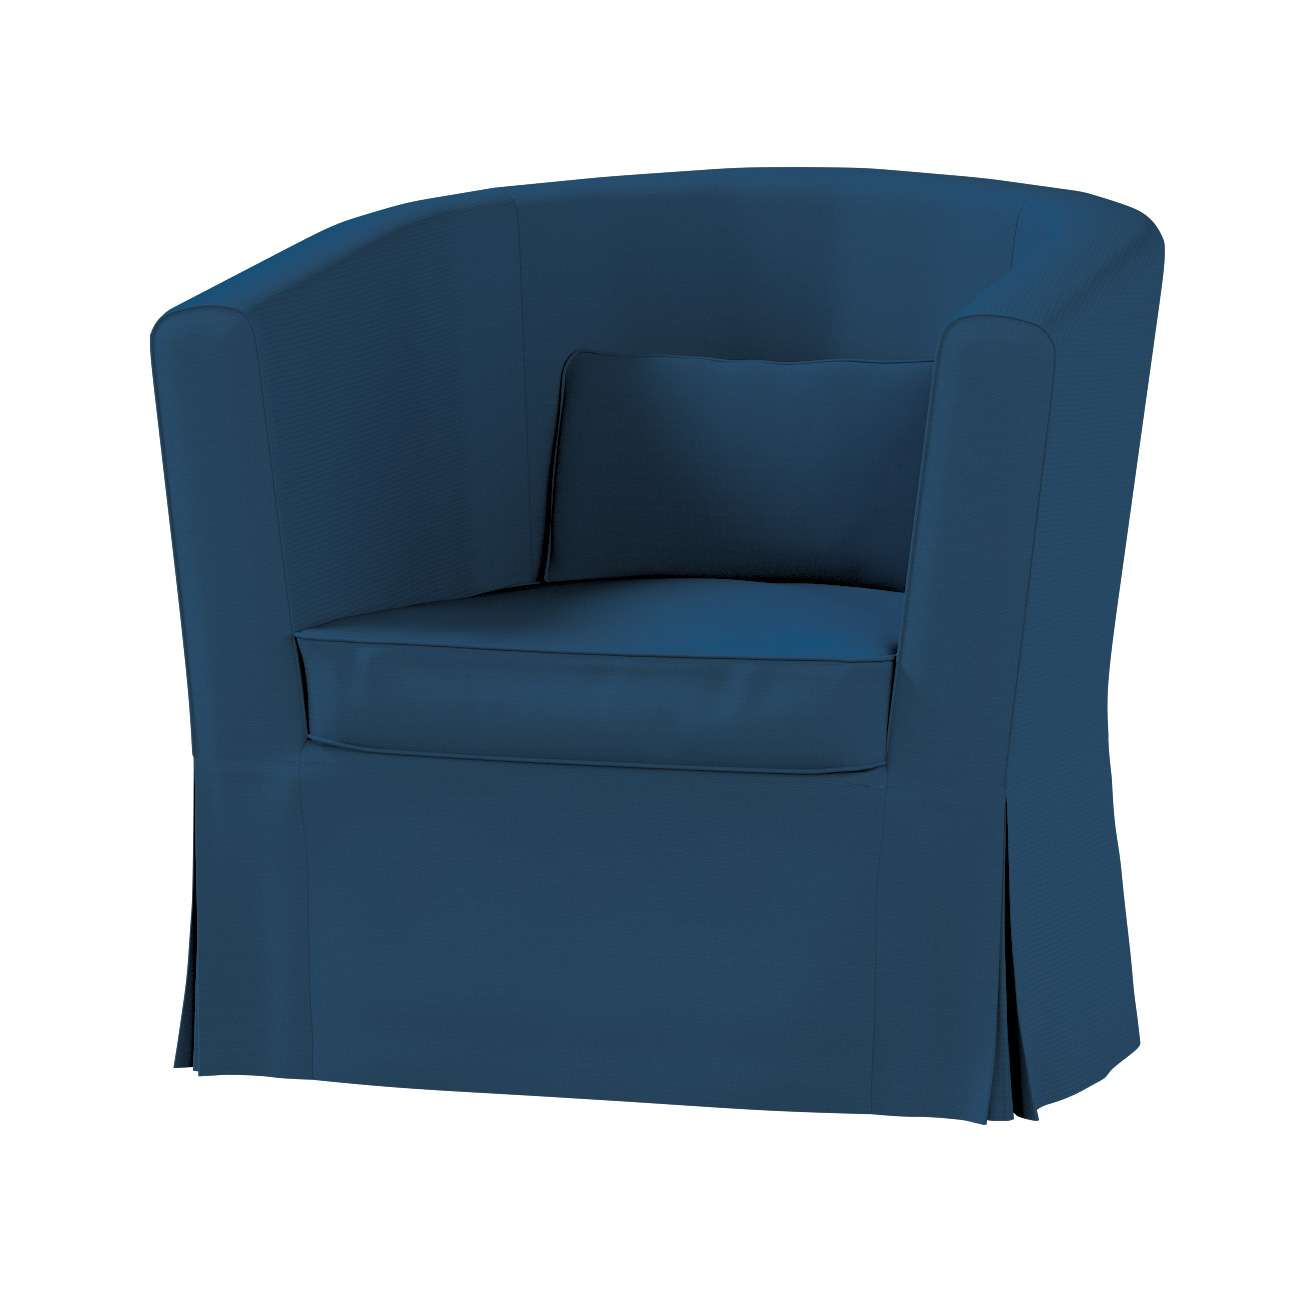 Pokrowiec na fotel Ektorp Tullsta fotel Ektorp Tullsta w kolekcji Cotton Panama, tkanina: 702-30